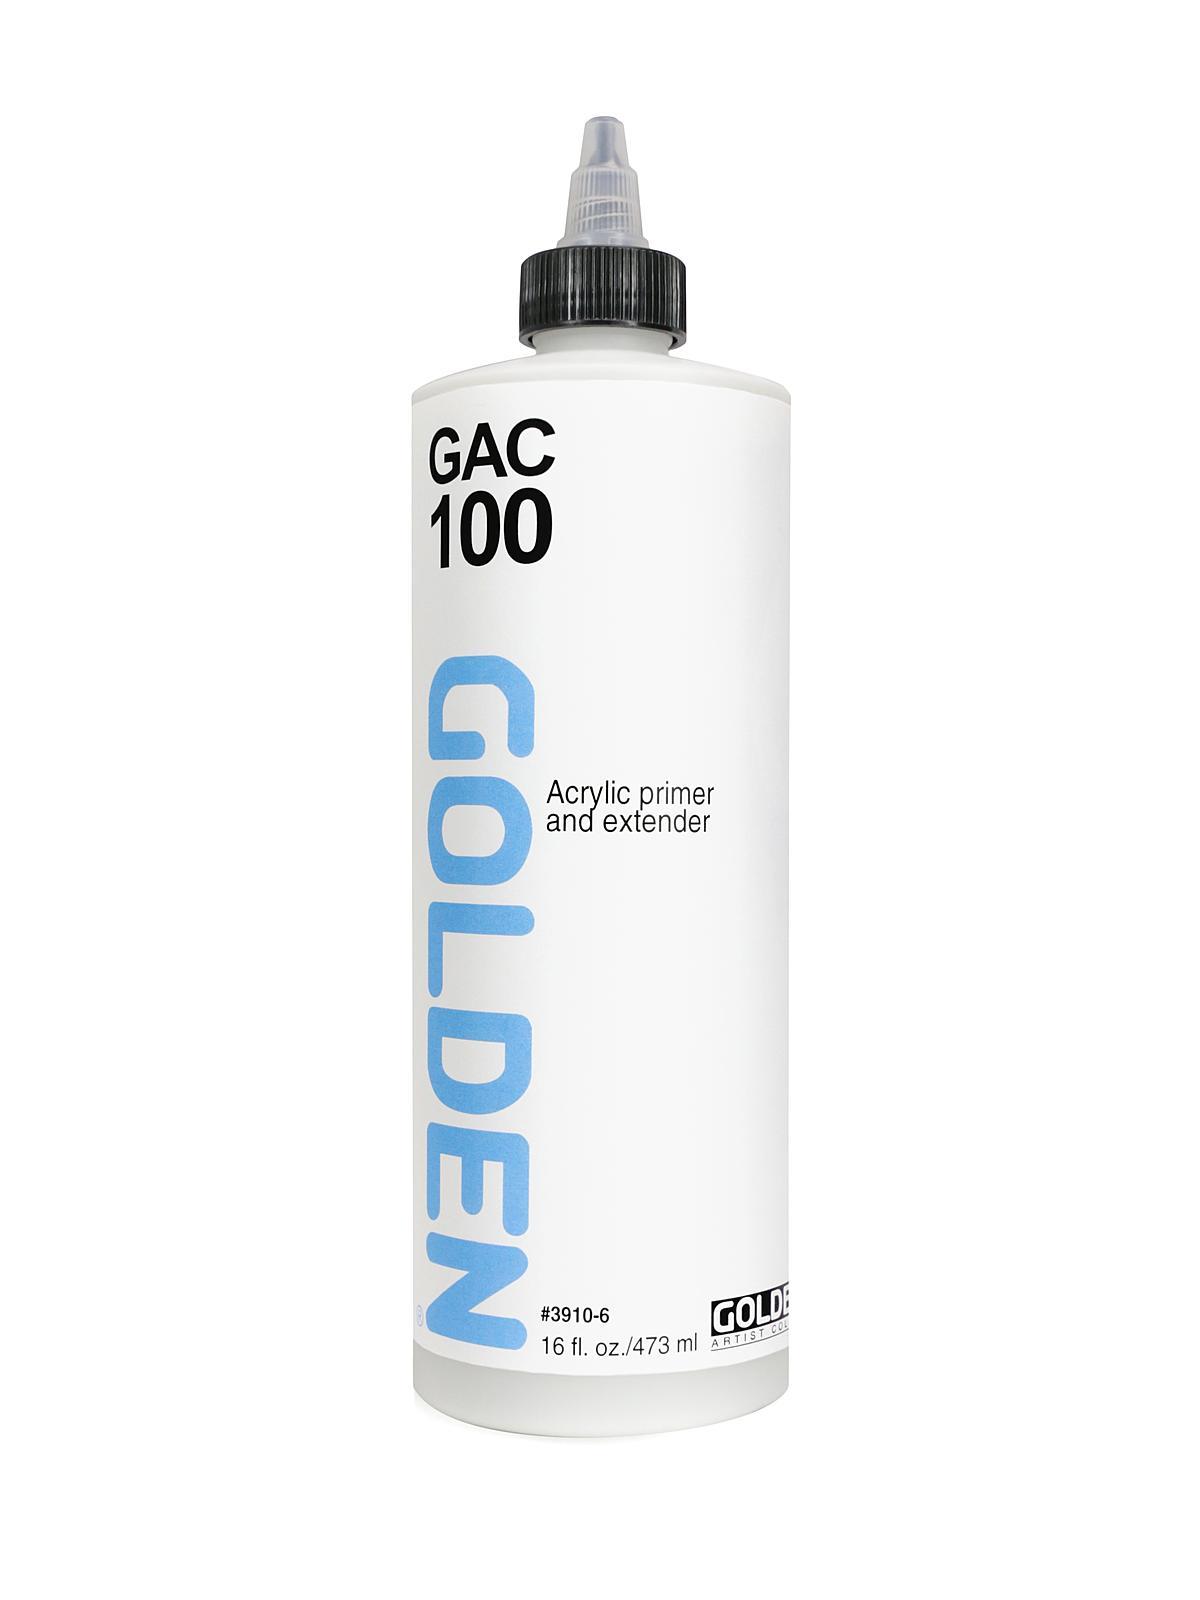 Golden Universal Tarot Reading: Golden GAC 100 Universal Acrylic Polymer Medium